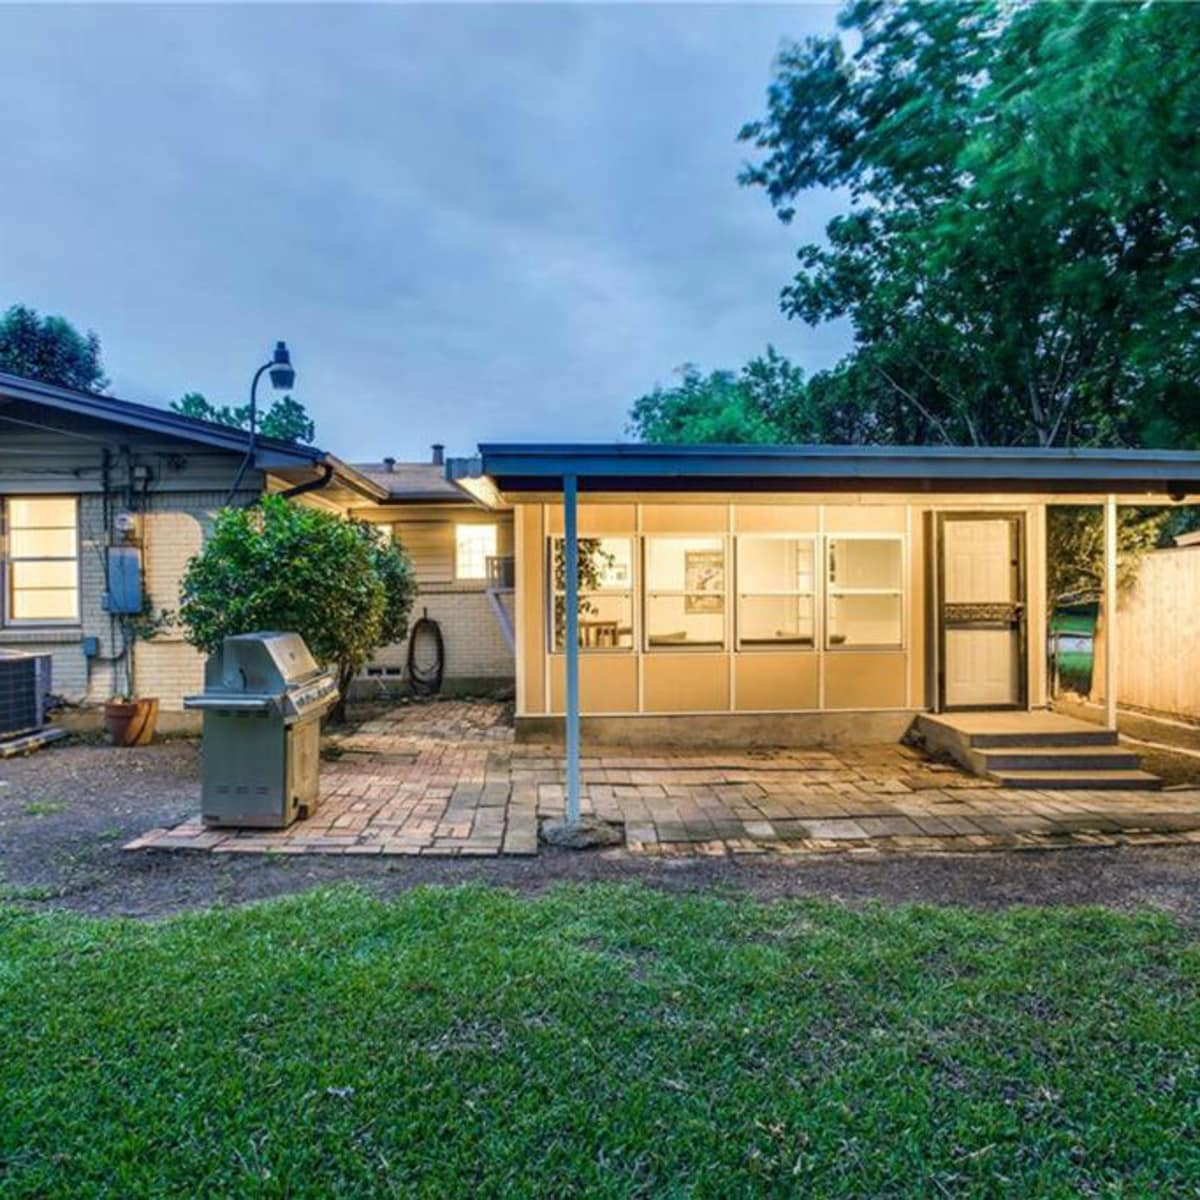 Backyard at 11207 Sinclair Ave in Dallas